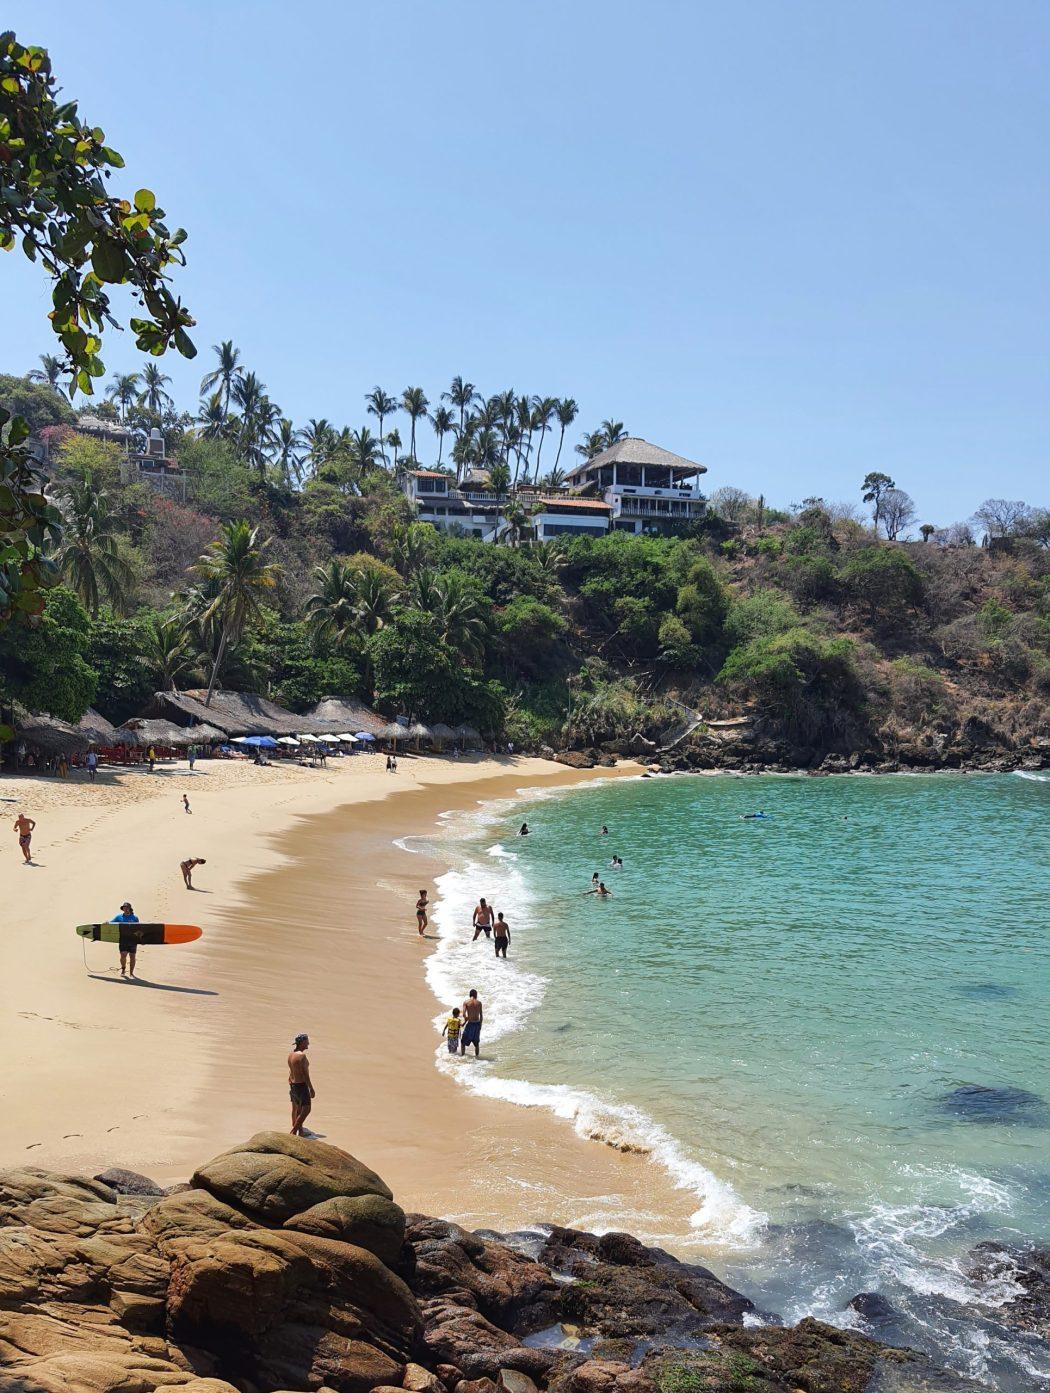 Playa Carrizillio, Puerto Escondido, Oaxaca, Mexico